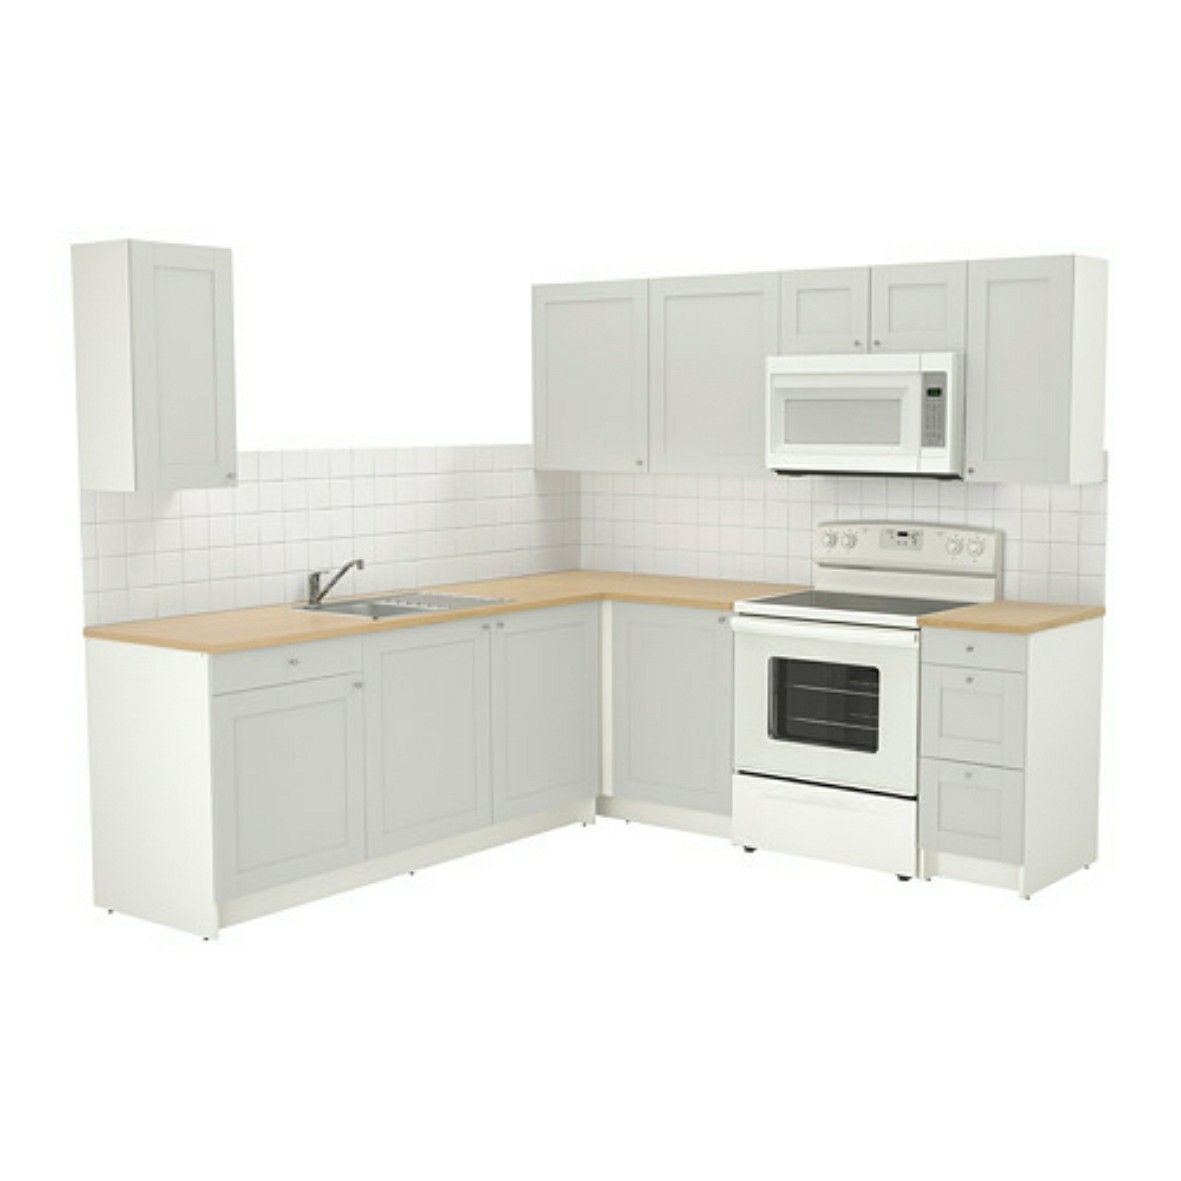 Ikea modular kitchen | New Home | Pinterest